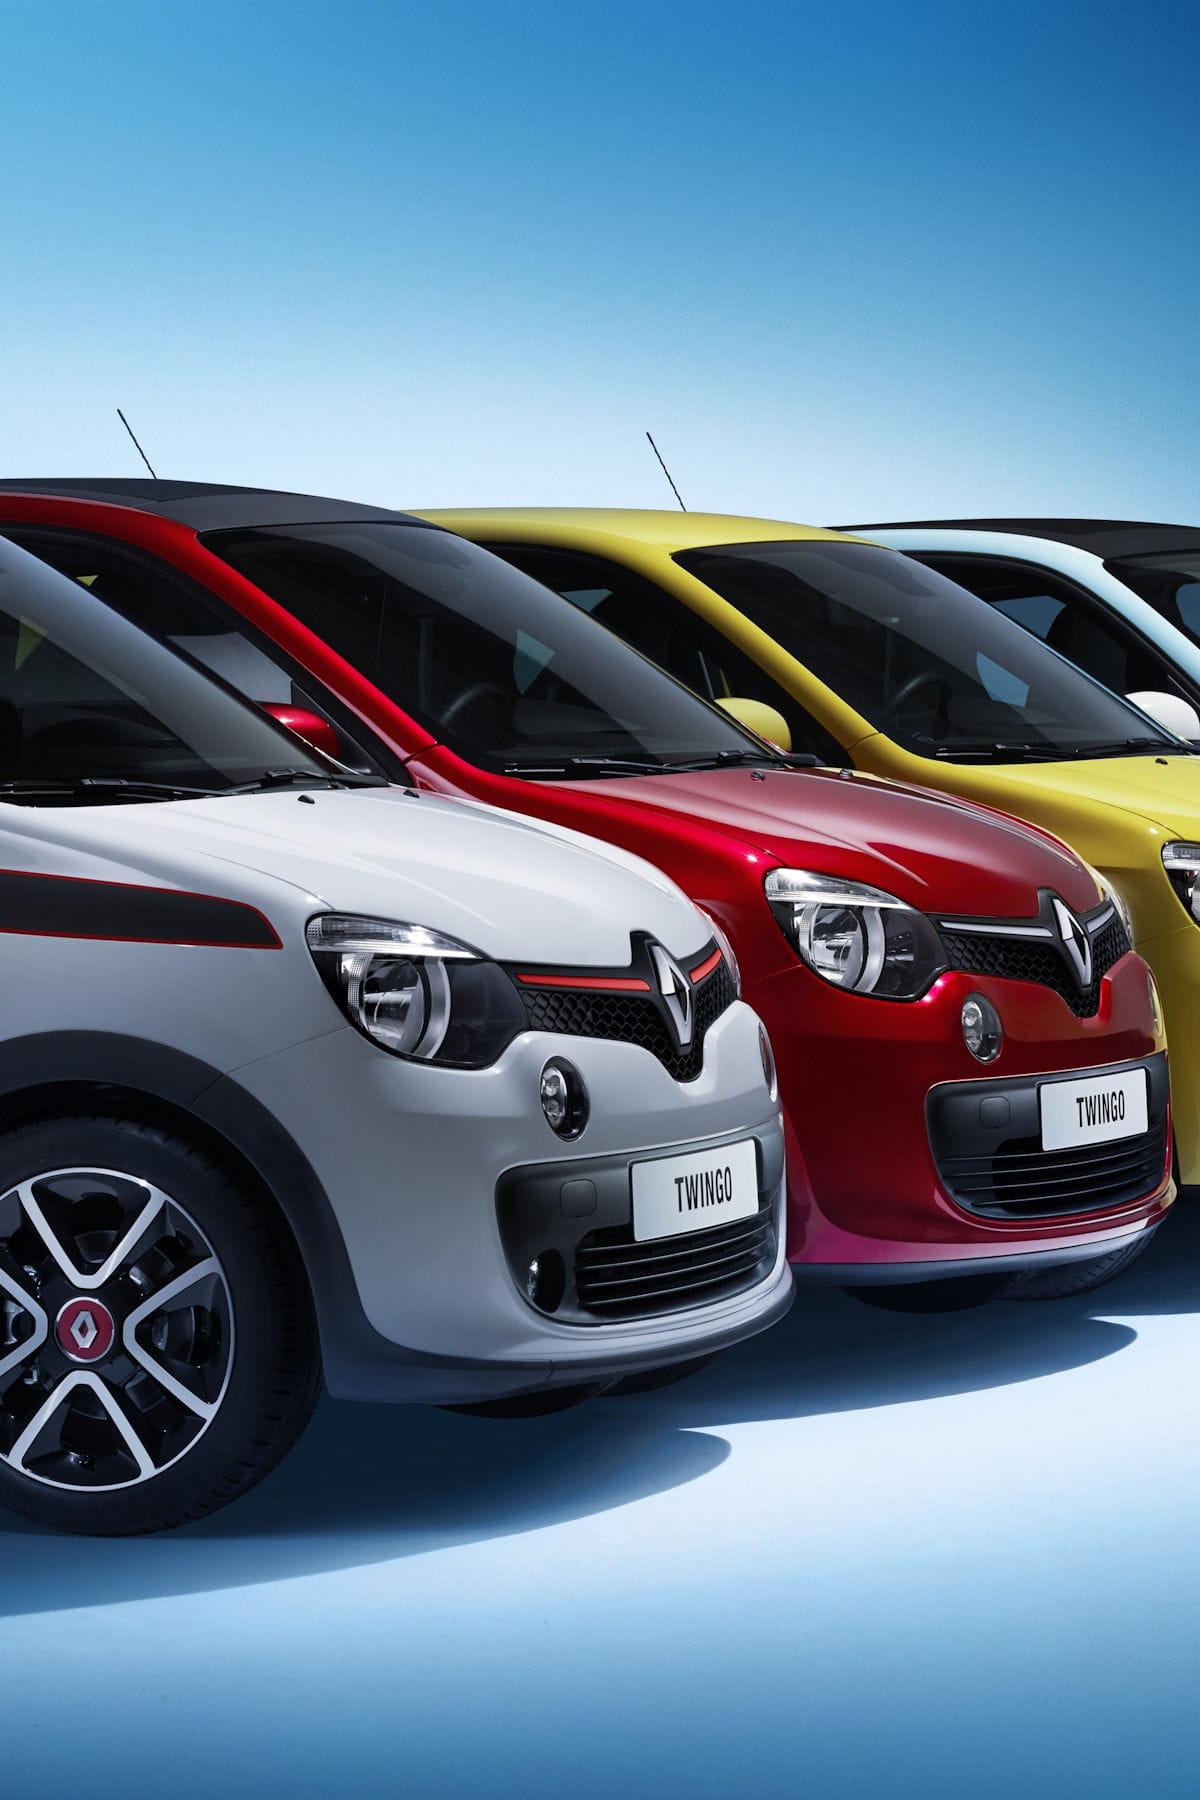 Renault Twingo 99 Euros Par Mois